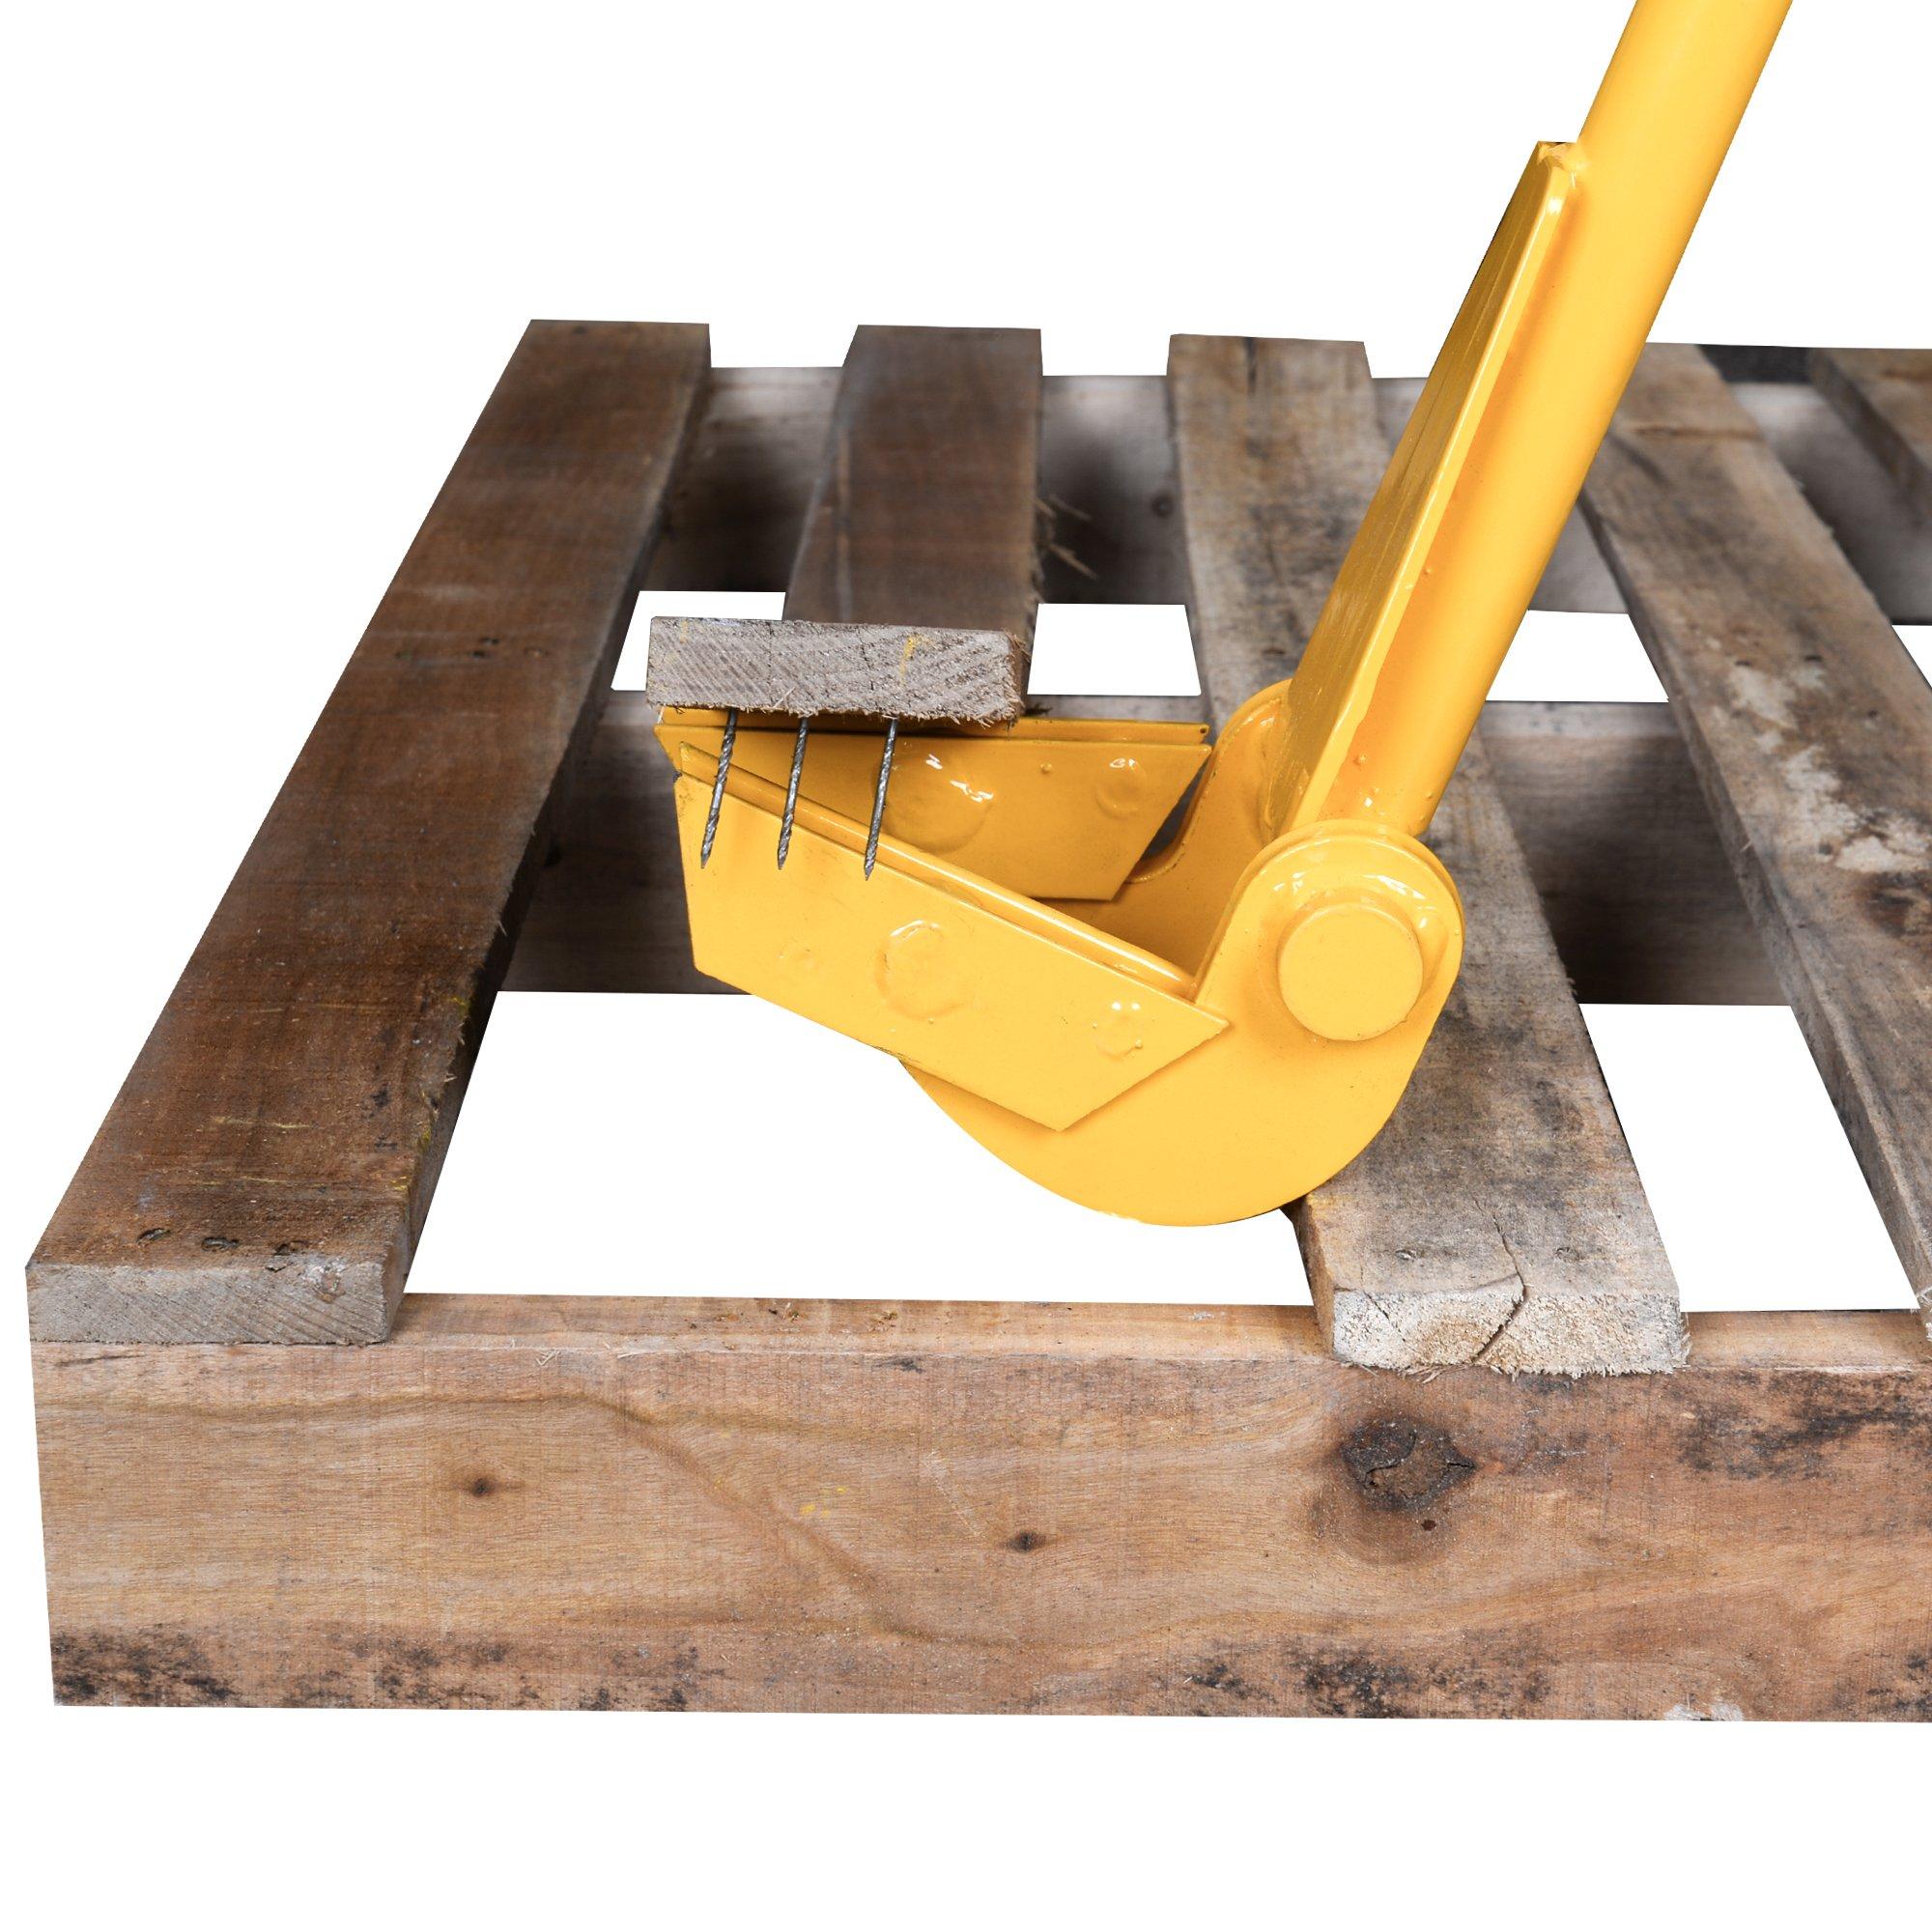 TIME SAVER - Pallet Buster Industrial Pry Bar For Easy Wood Pallet Destruction and Dismantler Premium Global Wood Breaker For Logistics Shippers Warehouses Anti Slip Grip Handles 41'' BL by 12Vmonster (Image #4)